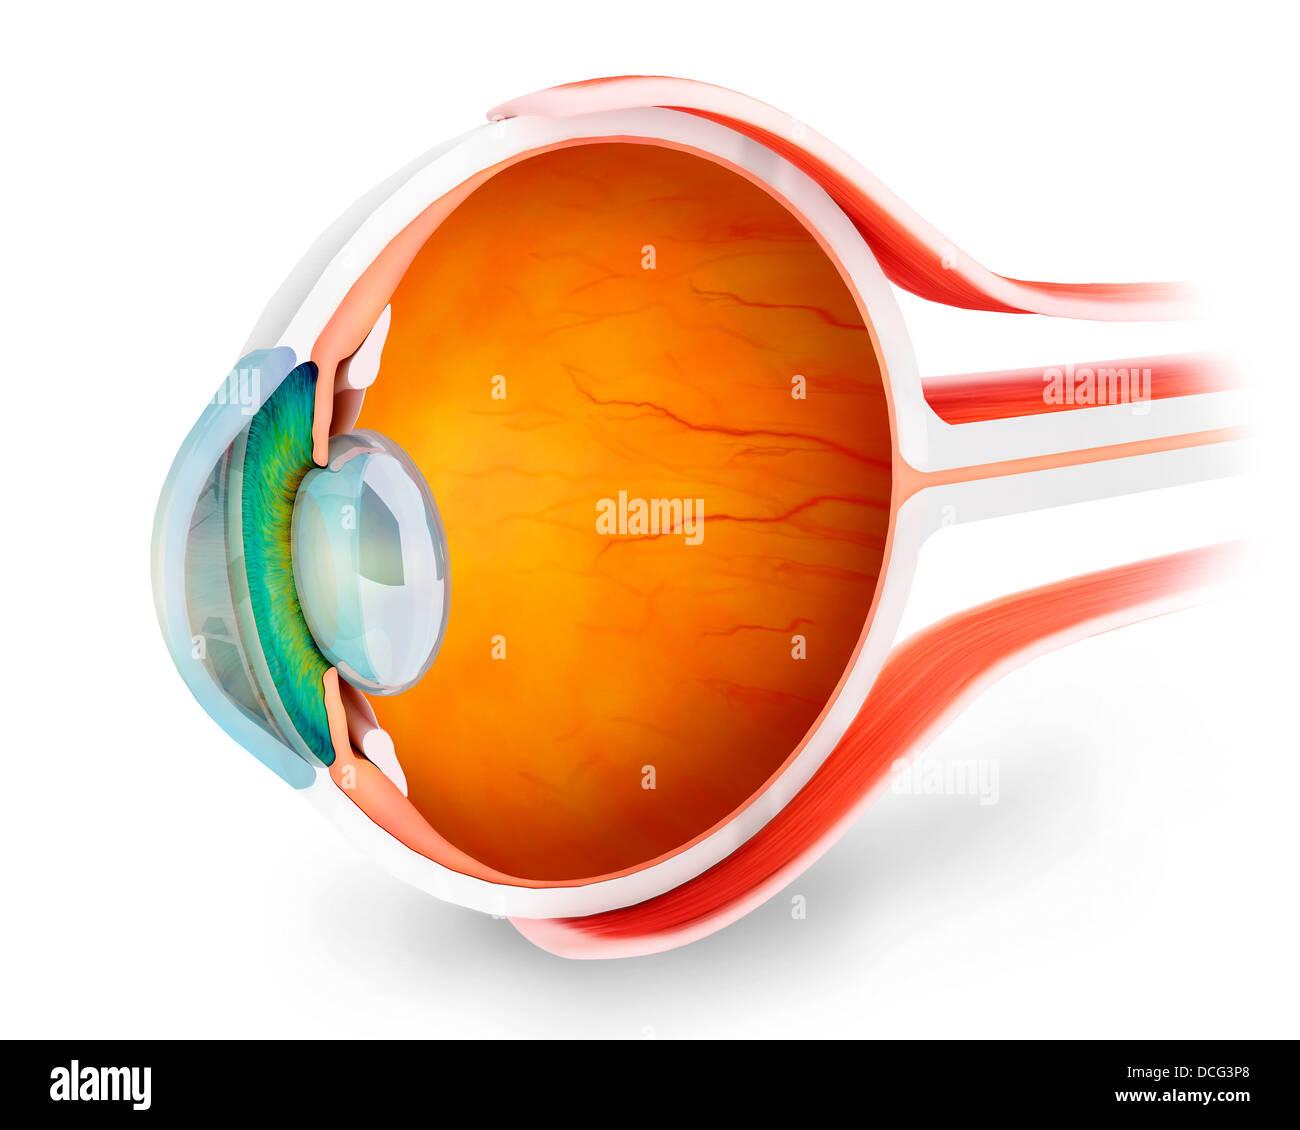 Eyeball Retina Cross Section Stockfotos & Eyeball Retina Cross ...